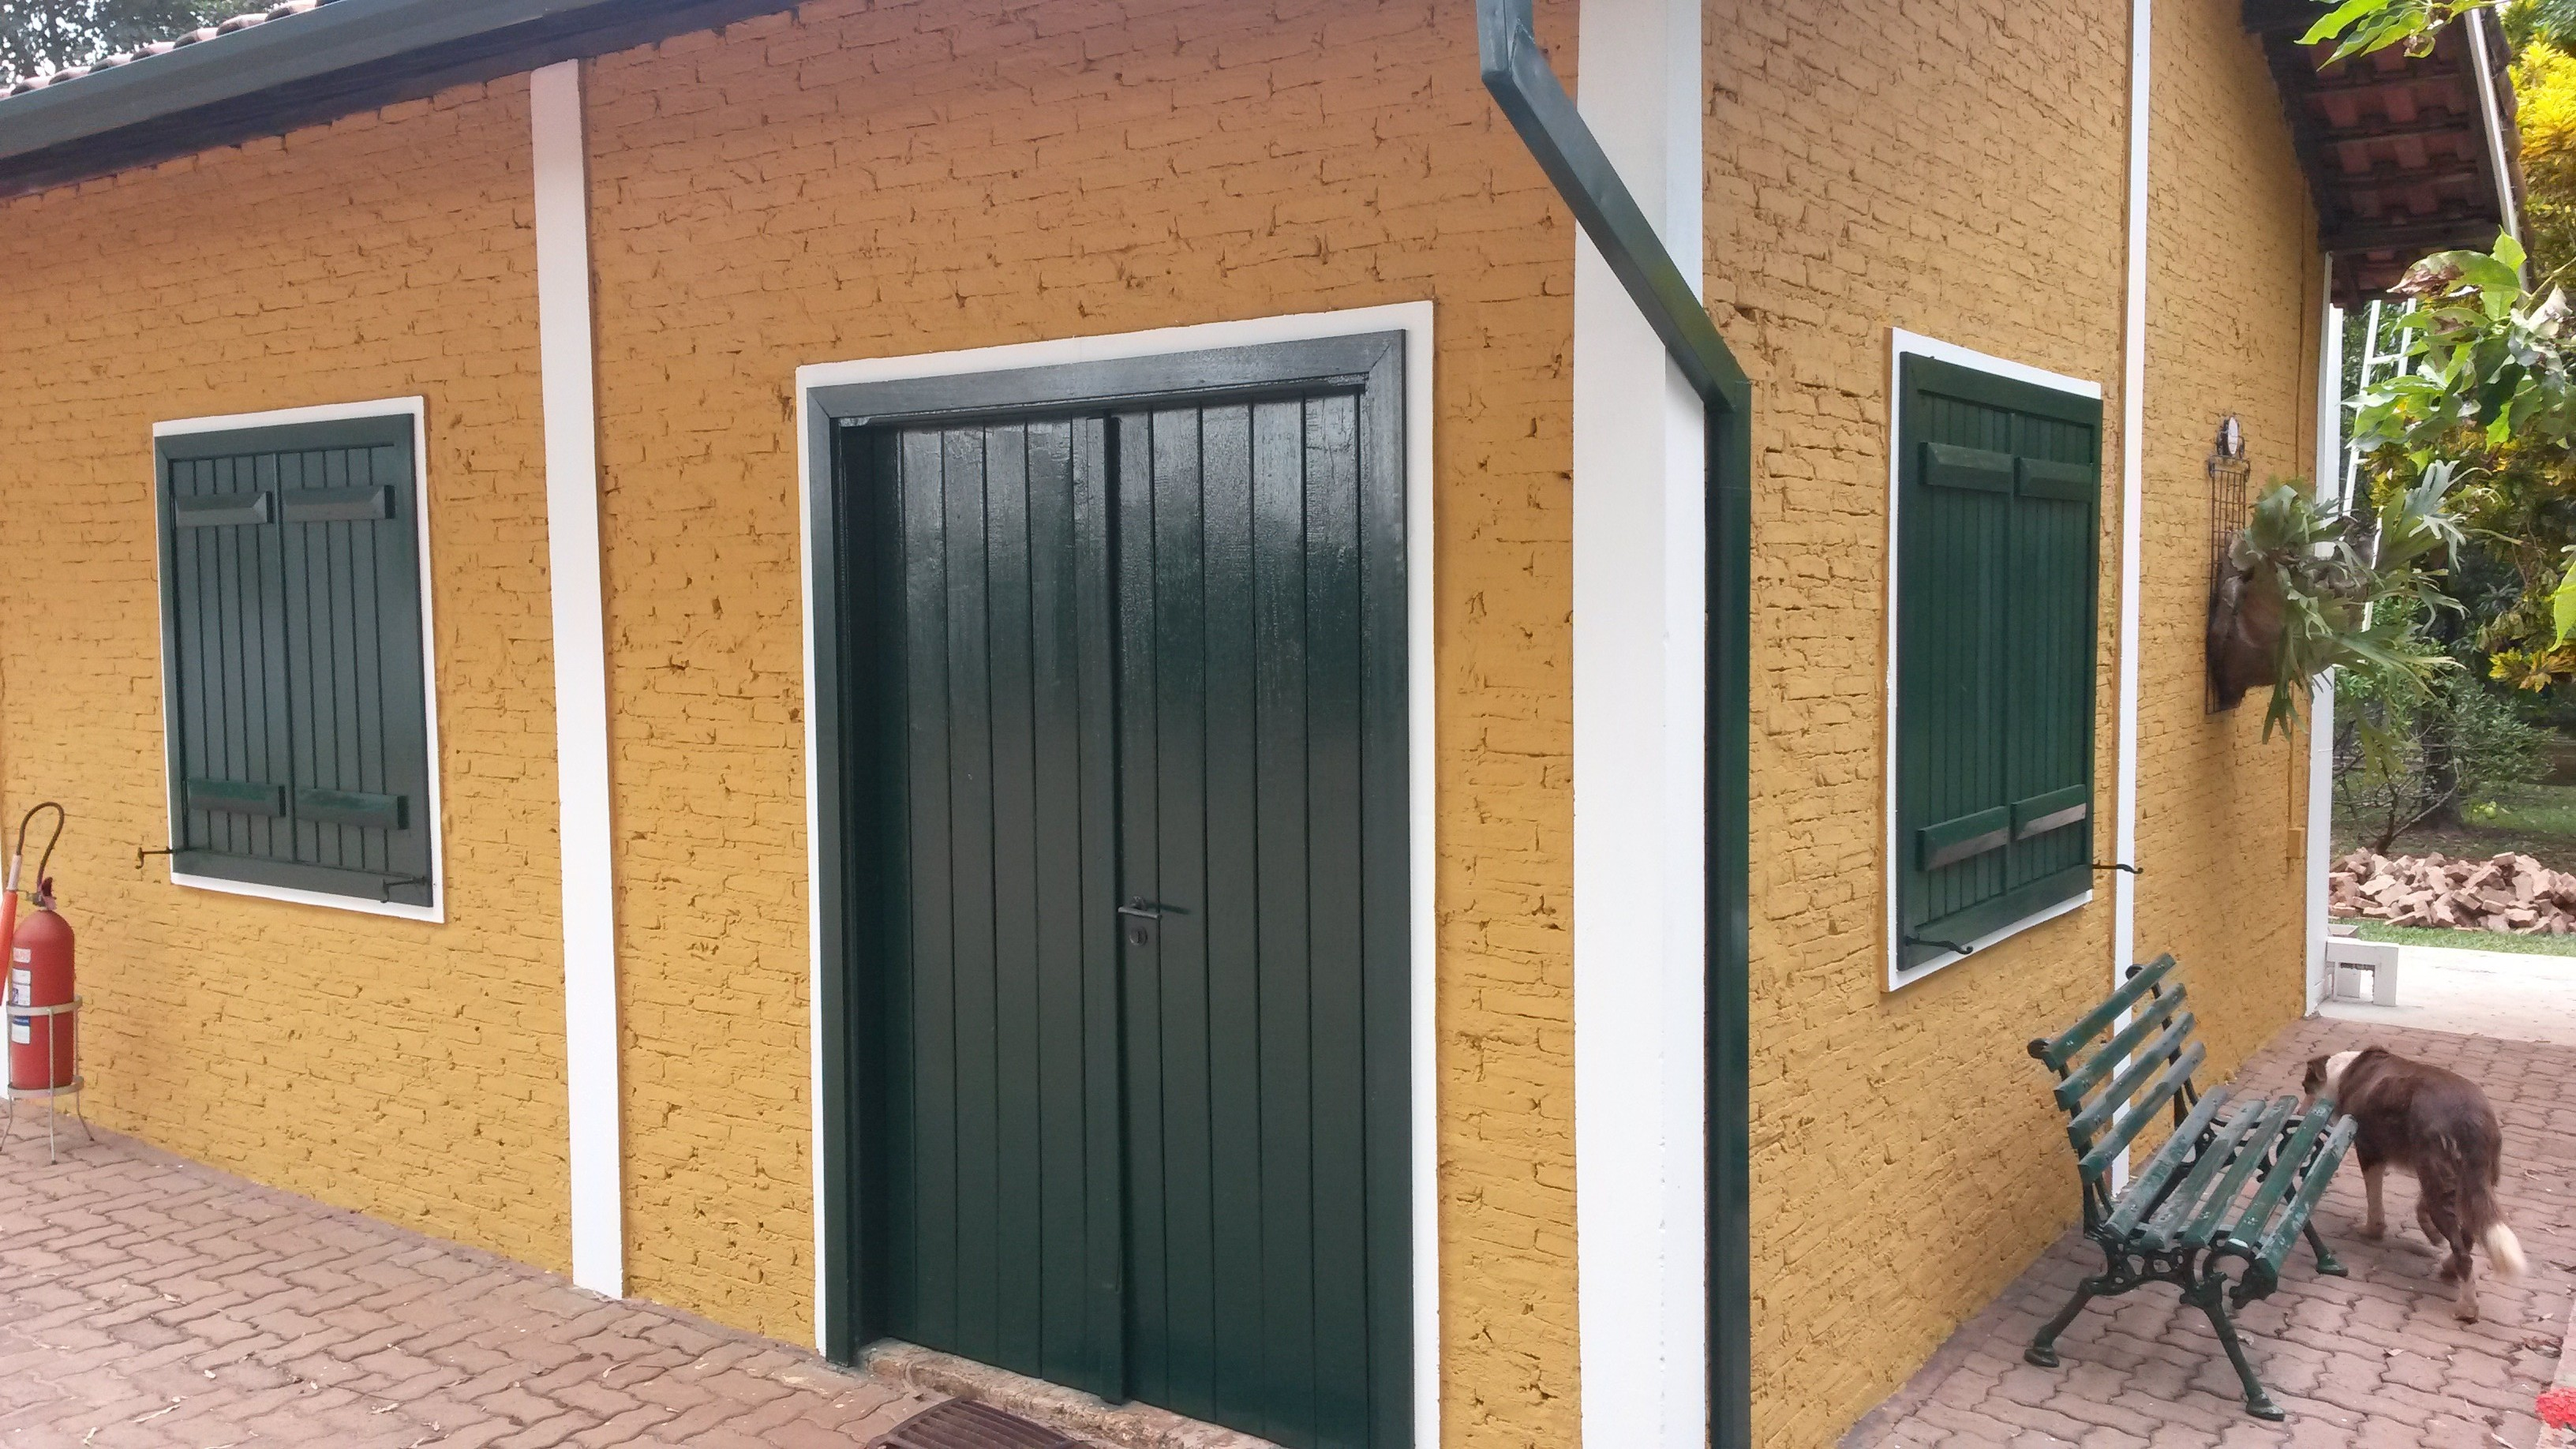 Portas e janelas verdes